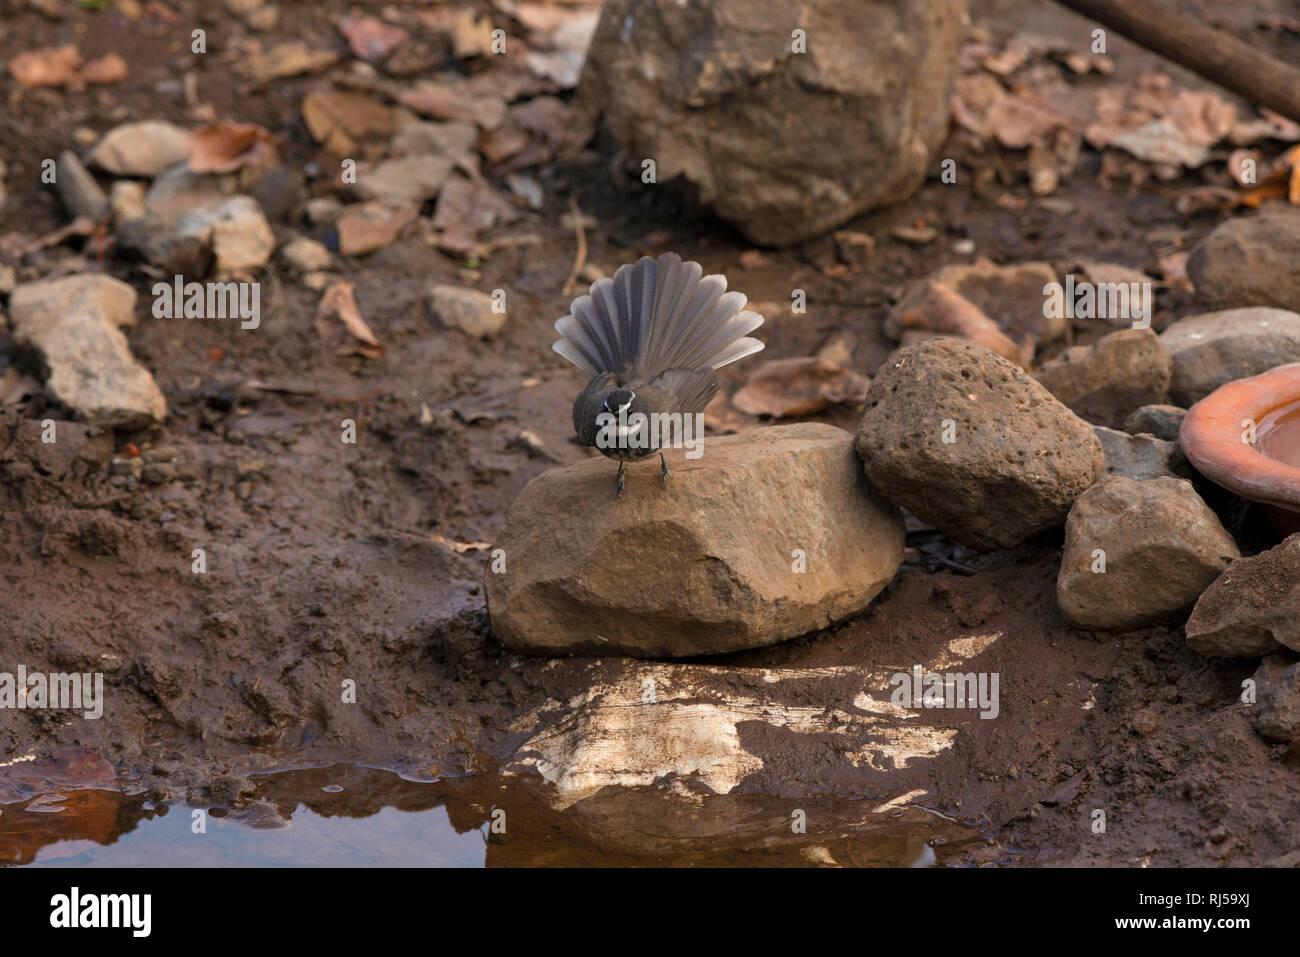 White-spotted fantail, Rhipidura albogularis, Sinhagad valley, Pune district, Maharashtra, India - Stock Image